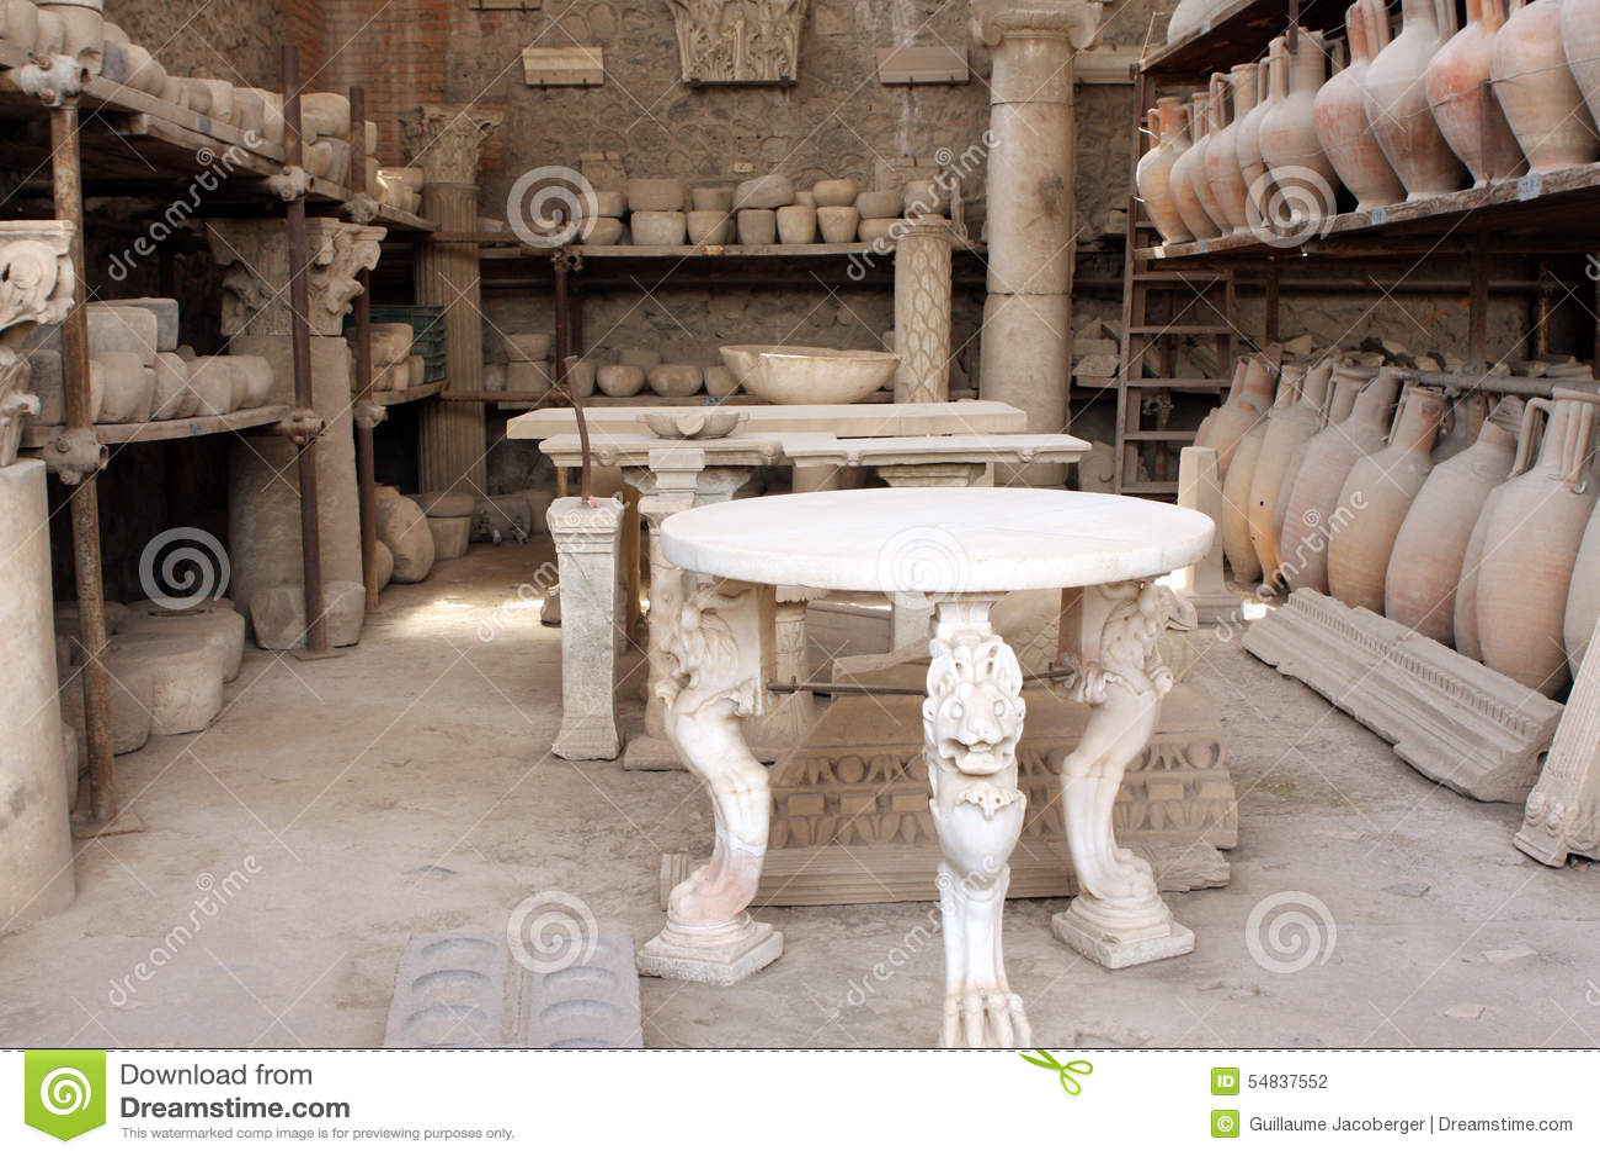 objeto romano antiguo italia de la ciudad de pompeya. Black Bedroom Furniture Sets. Home Design Ideas